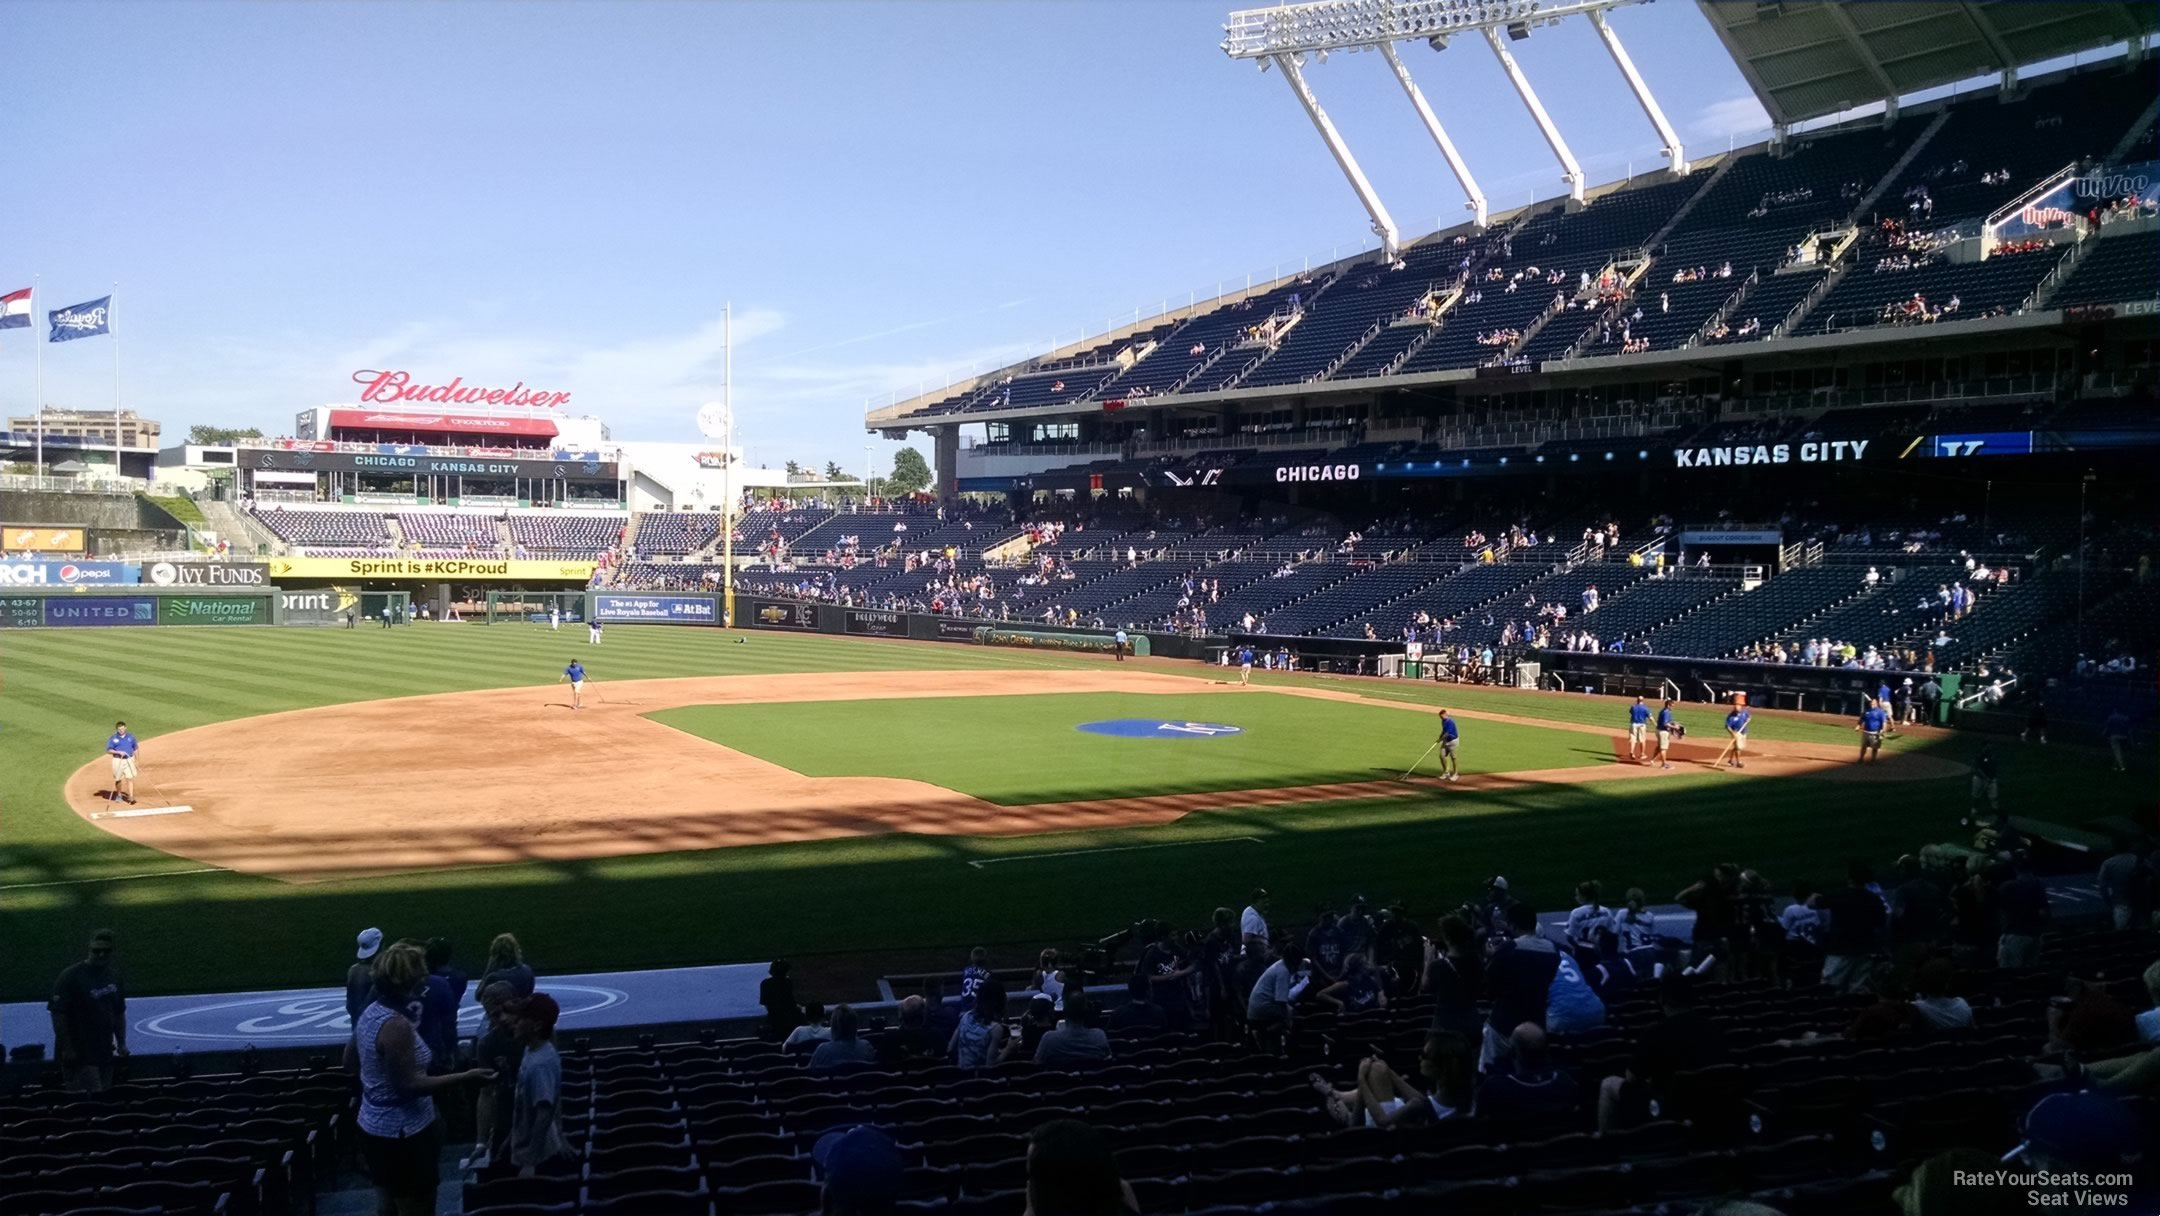 Kauffman Stadium Section 118 - RateYourSeats.com